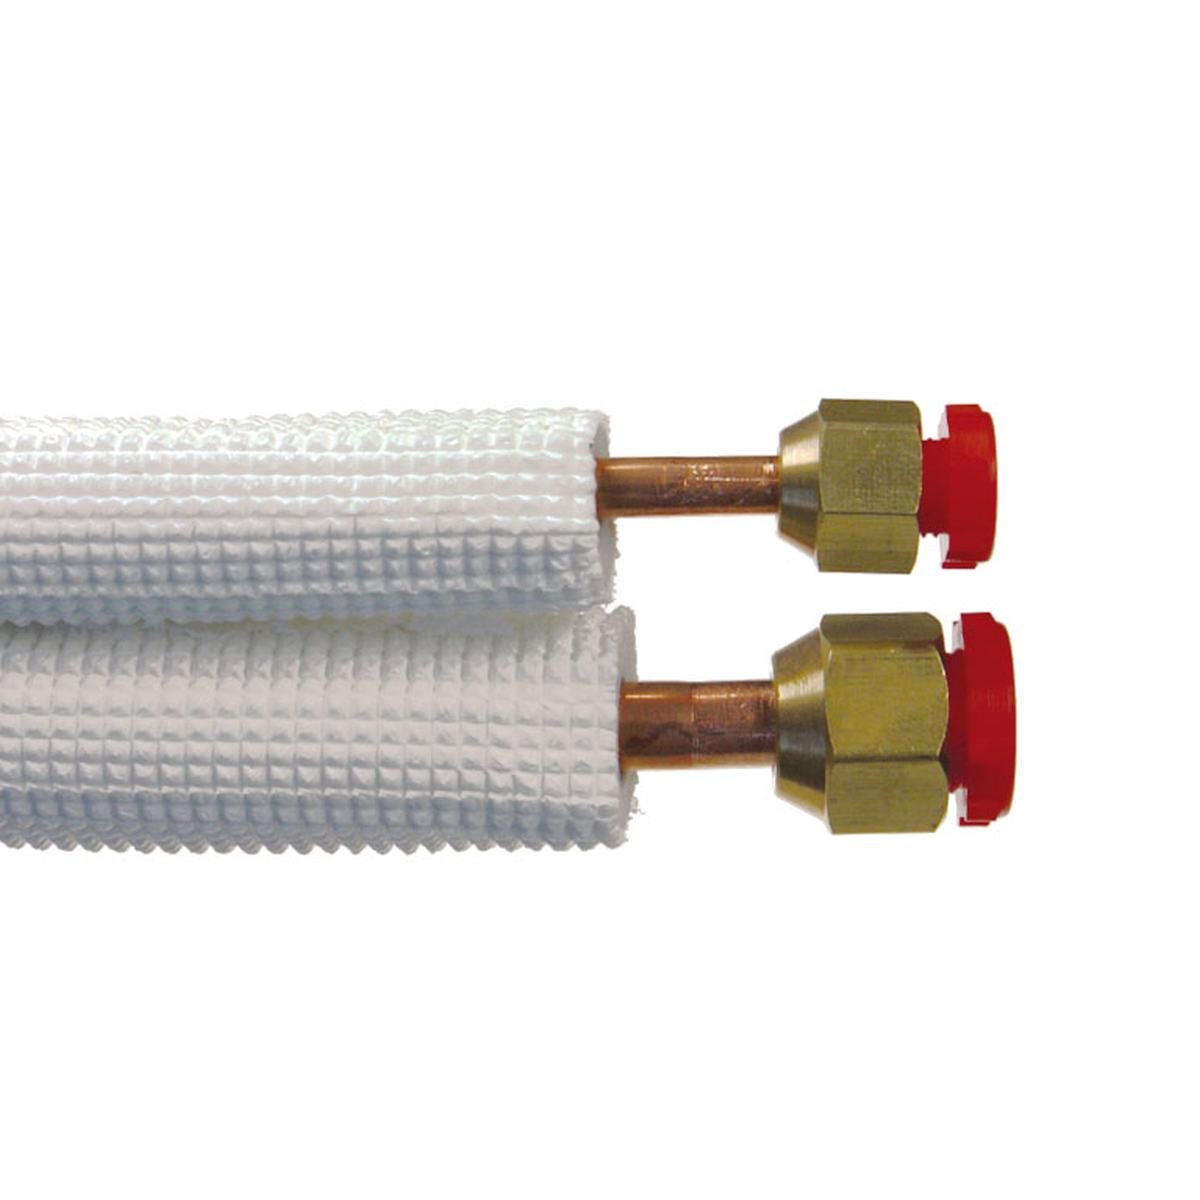 "Kopparrör isolerad dobb. 1/4""+3/8"" x 0,8 mm. 7 met"